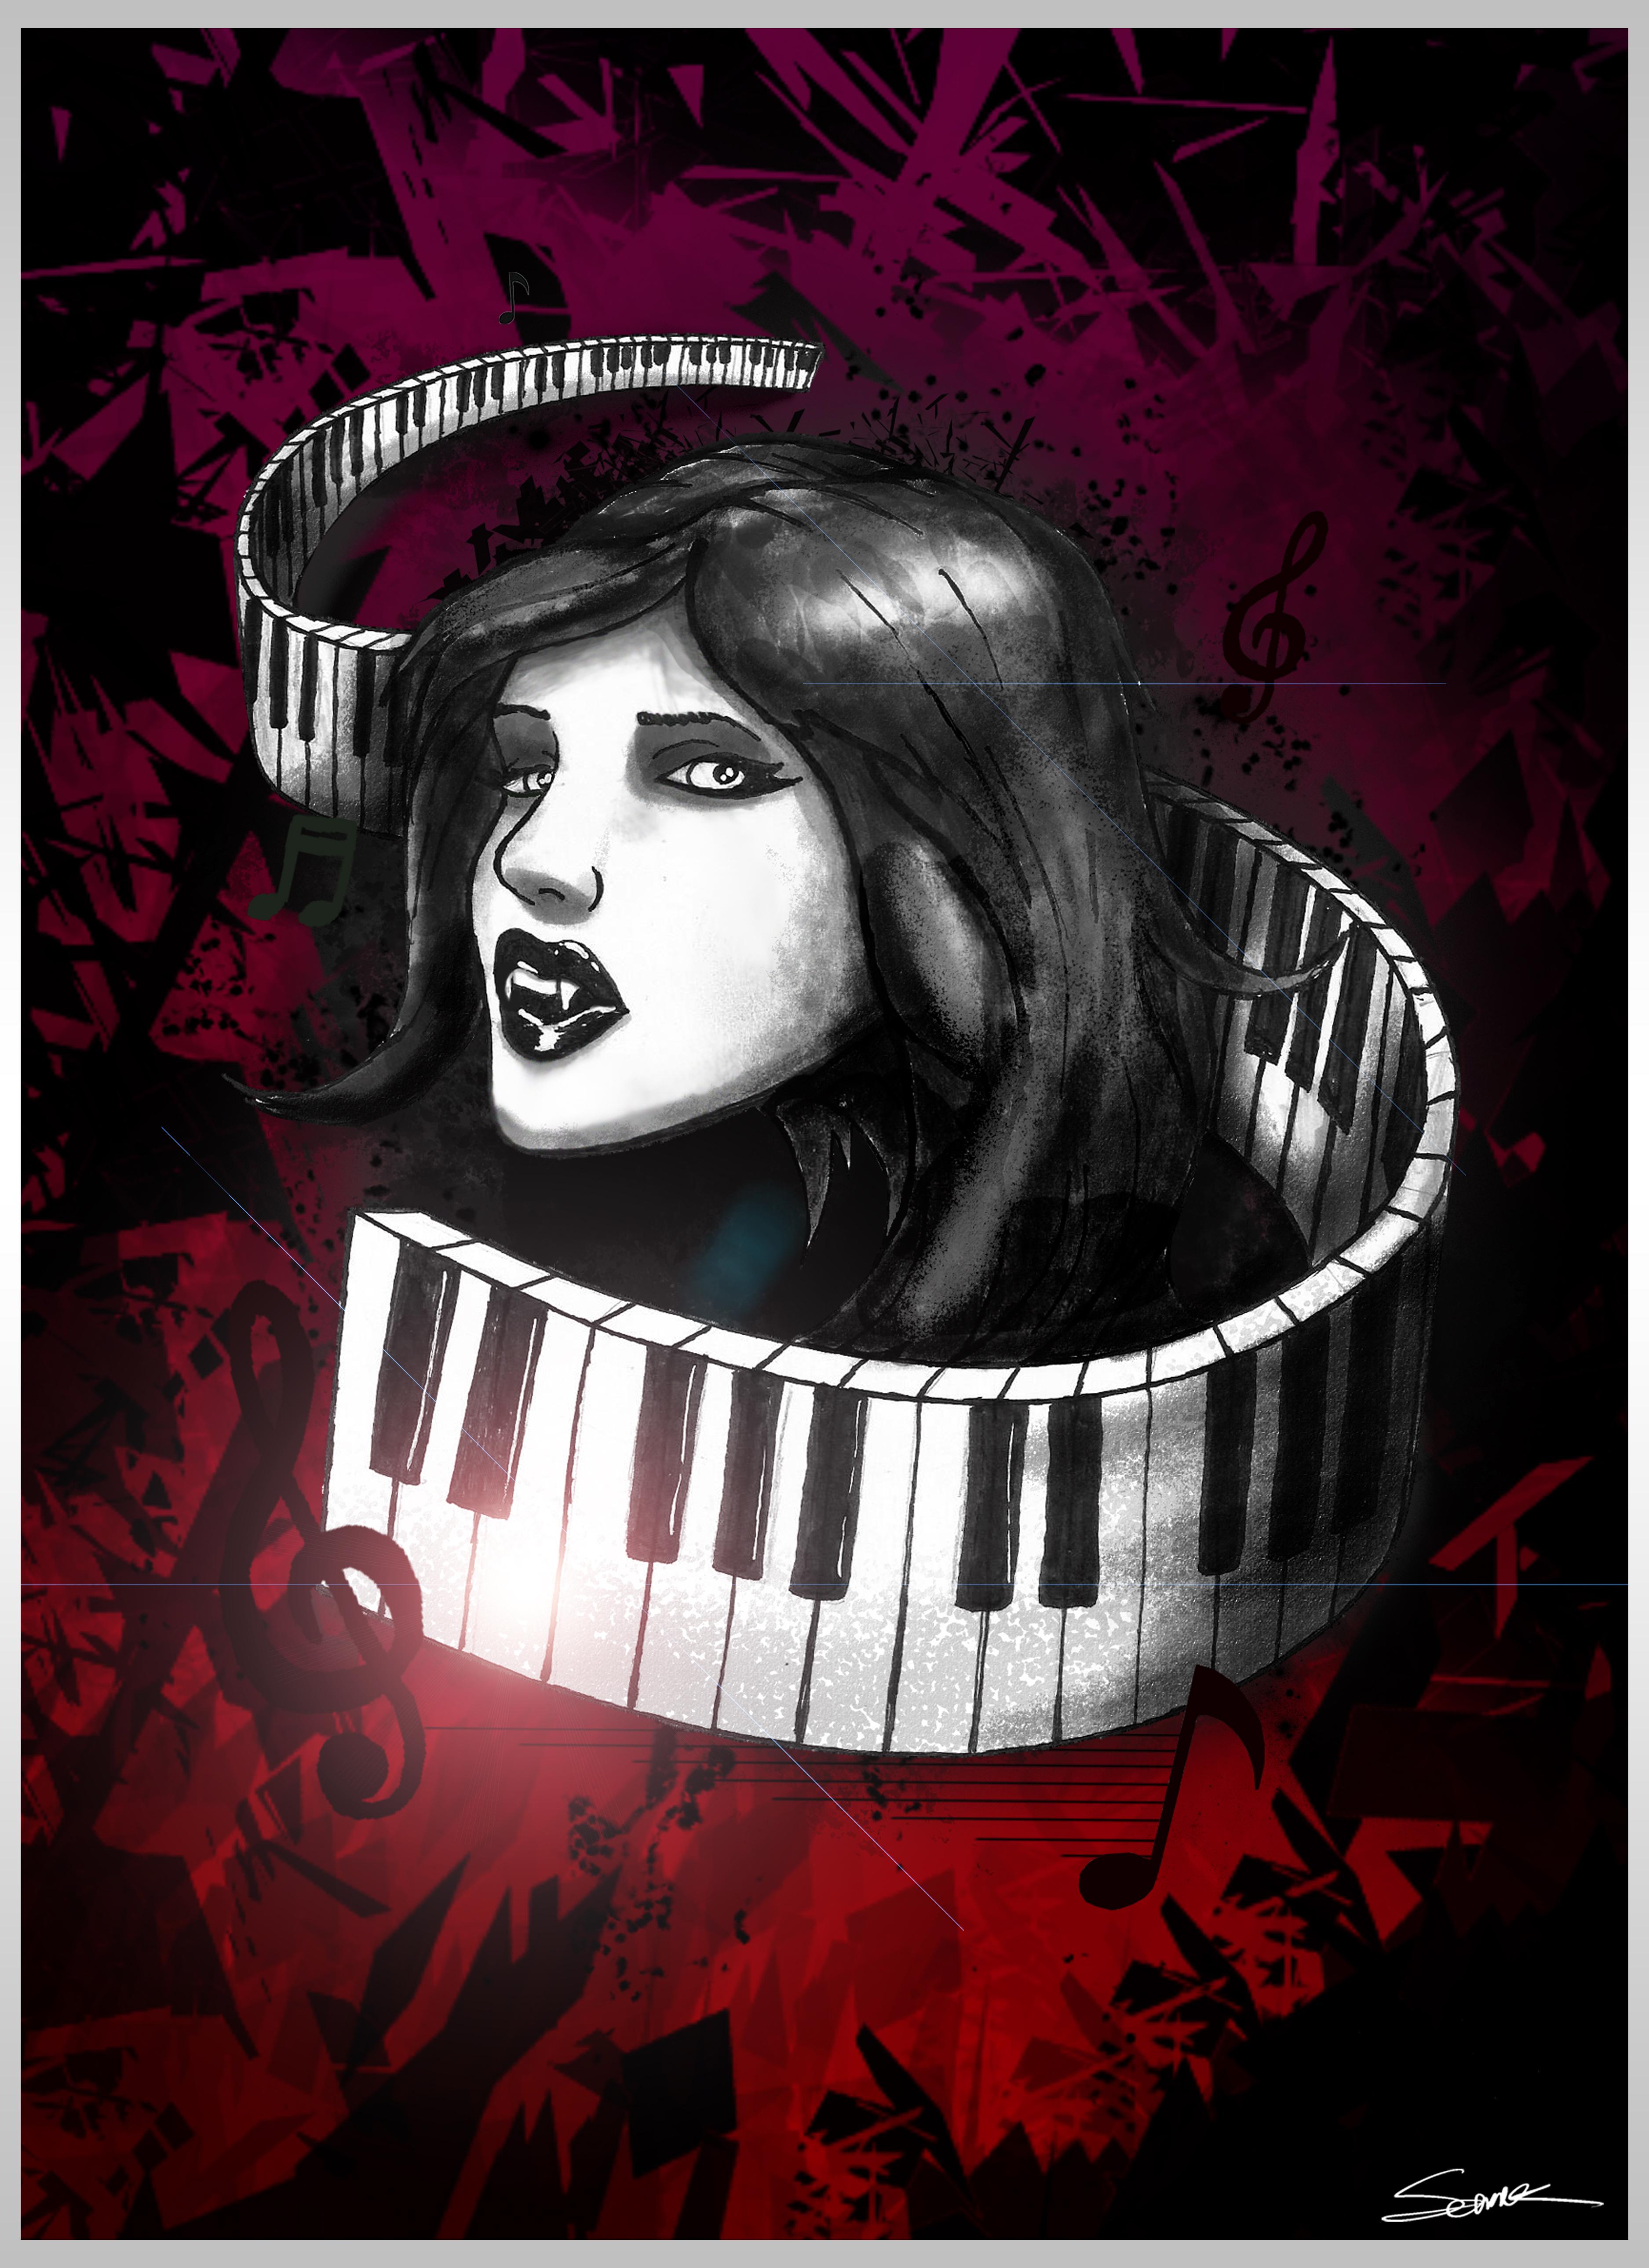 Bleeding Hearts & Artists